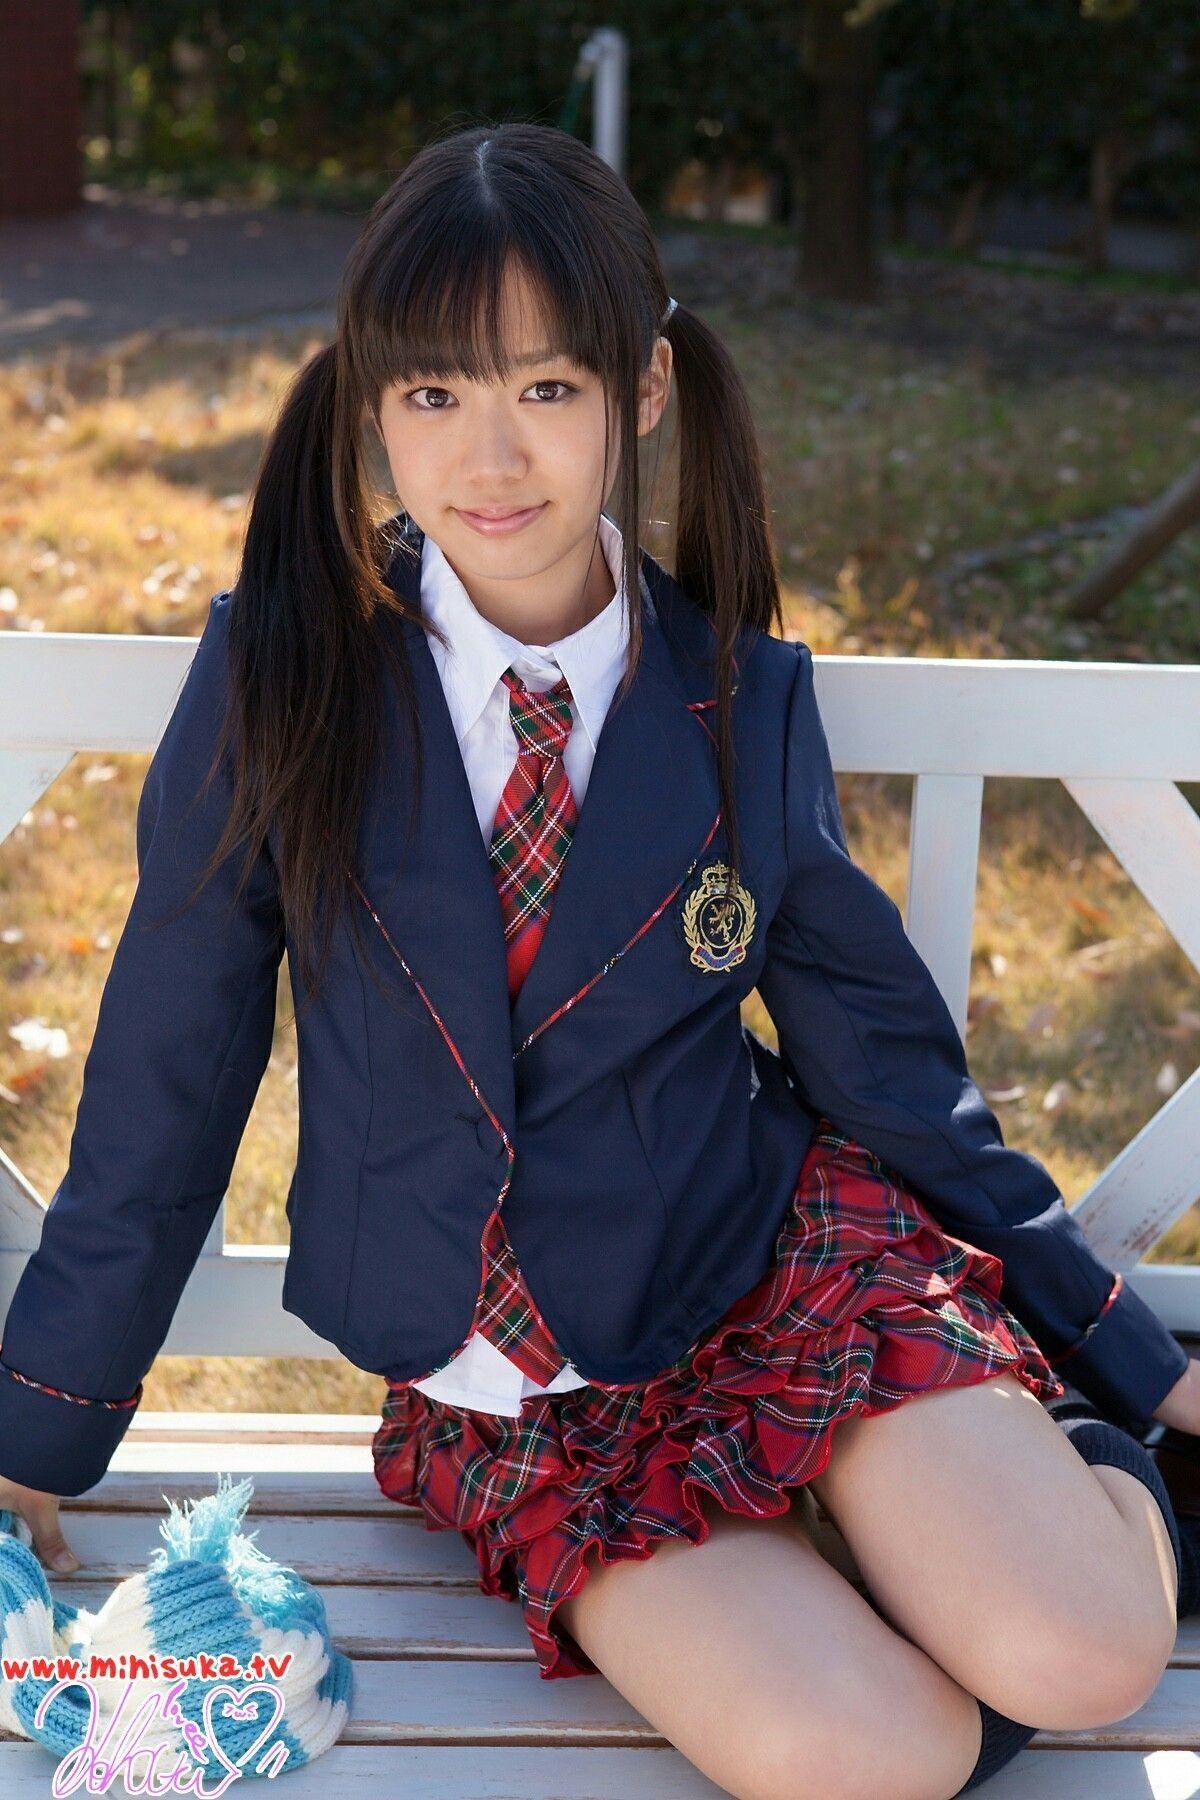 Cute Japanese and Asian School Girls: Japanese School Girl